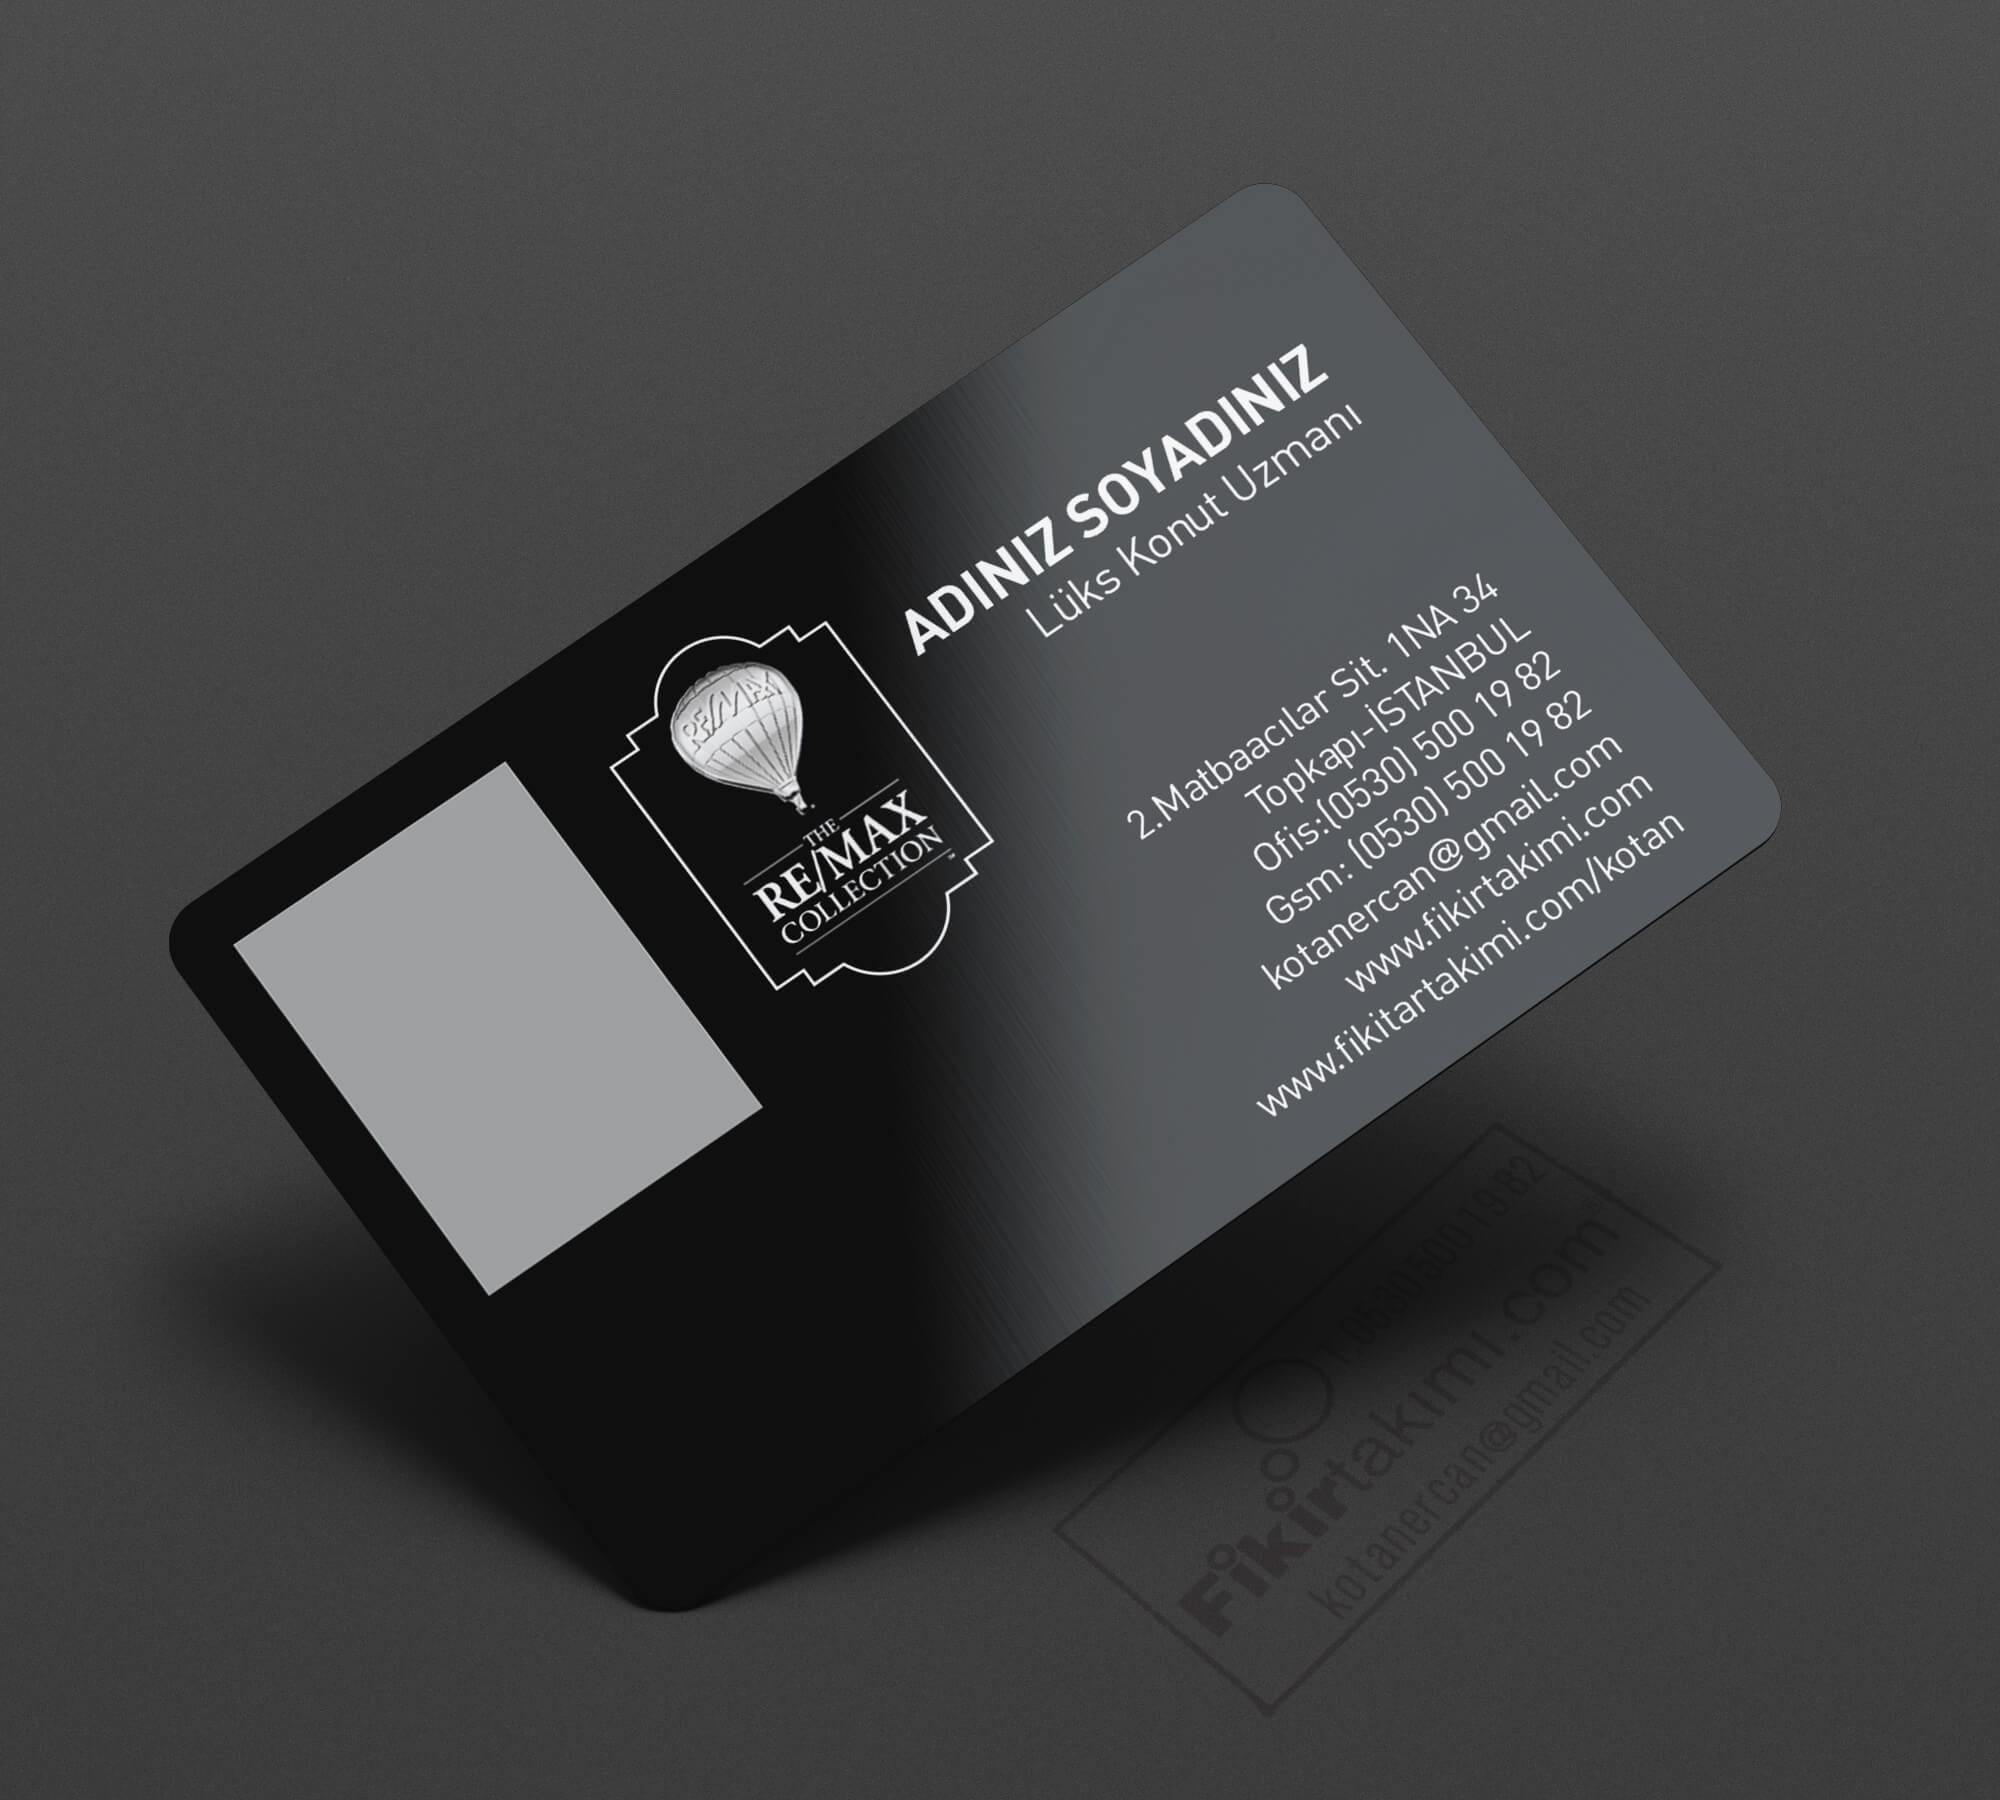 remax ticari kart, remax ticari kartvizit, Ticari Kartvizit, Lüks Konut Uzmanı kartvizit